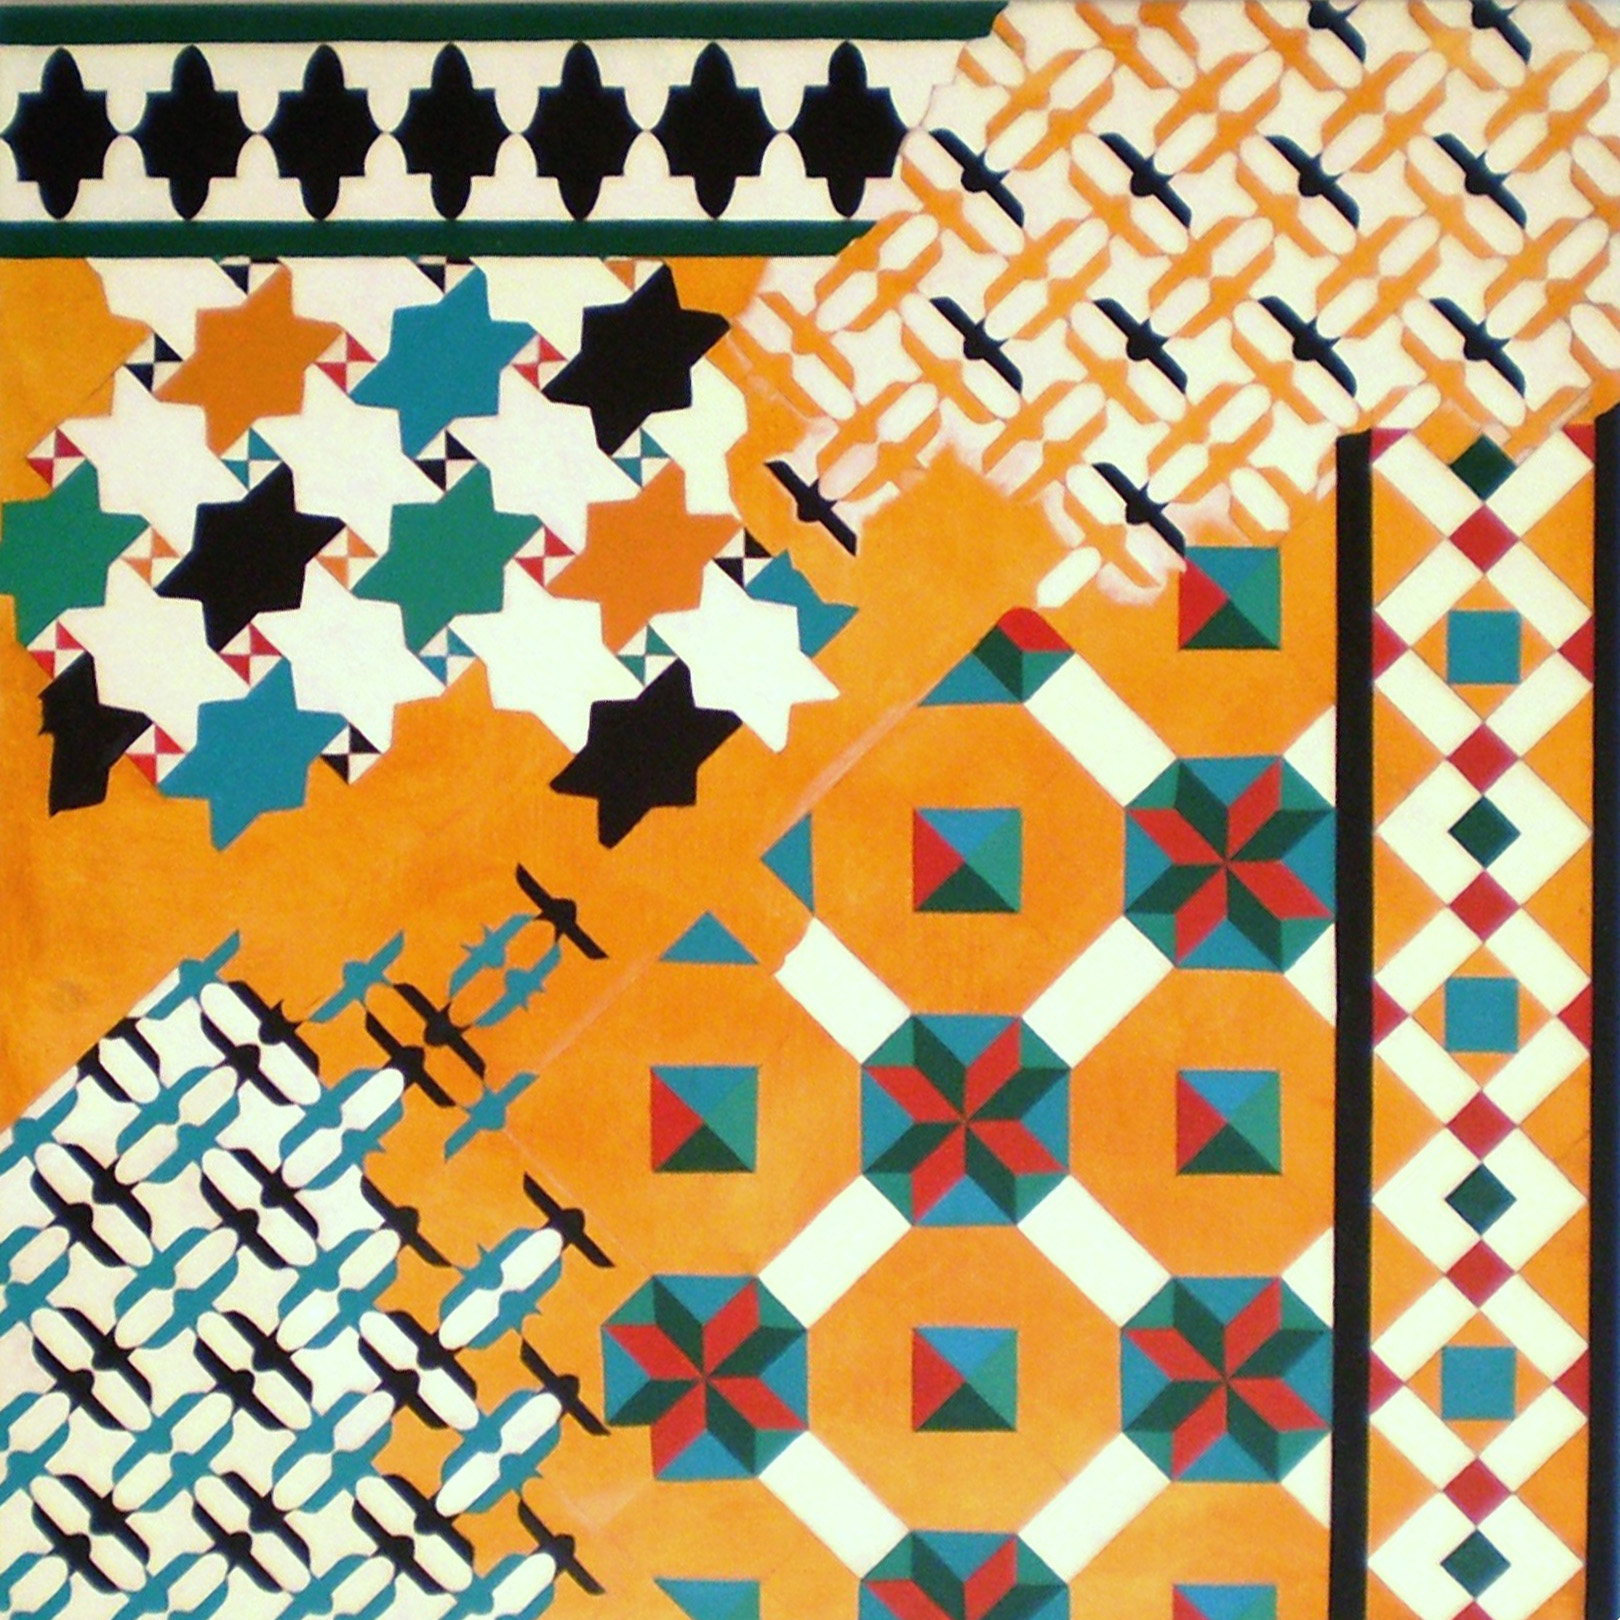 Sueño de Alhambra II